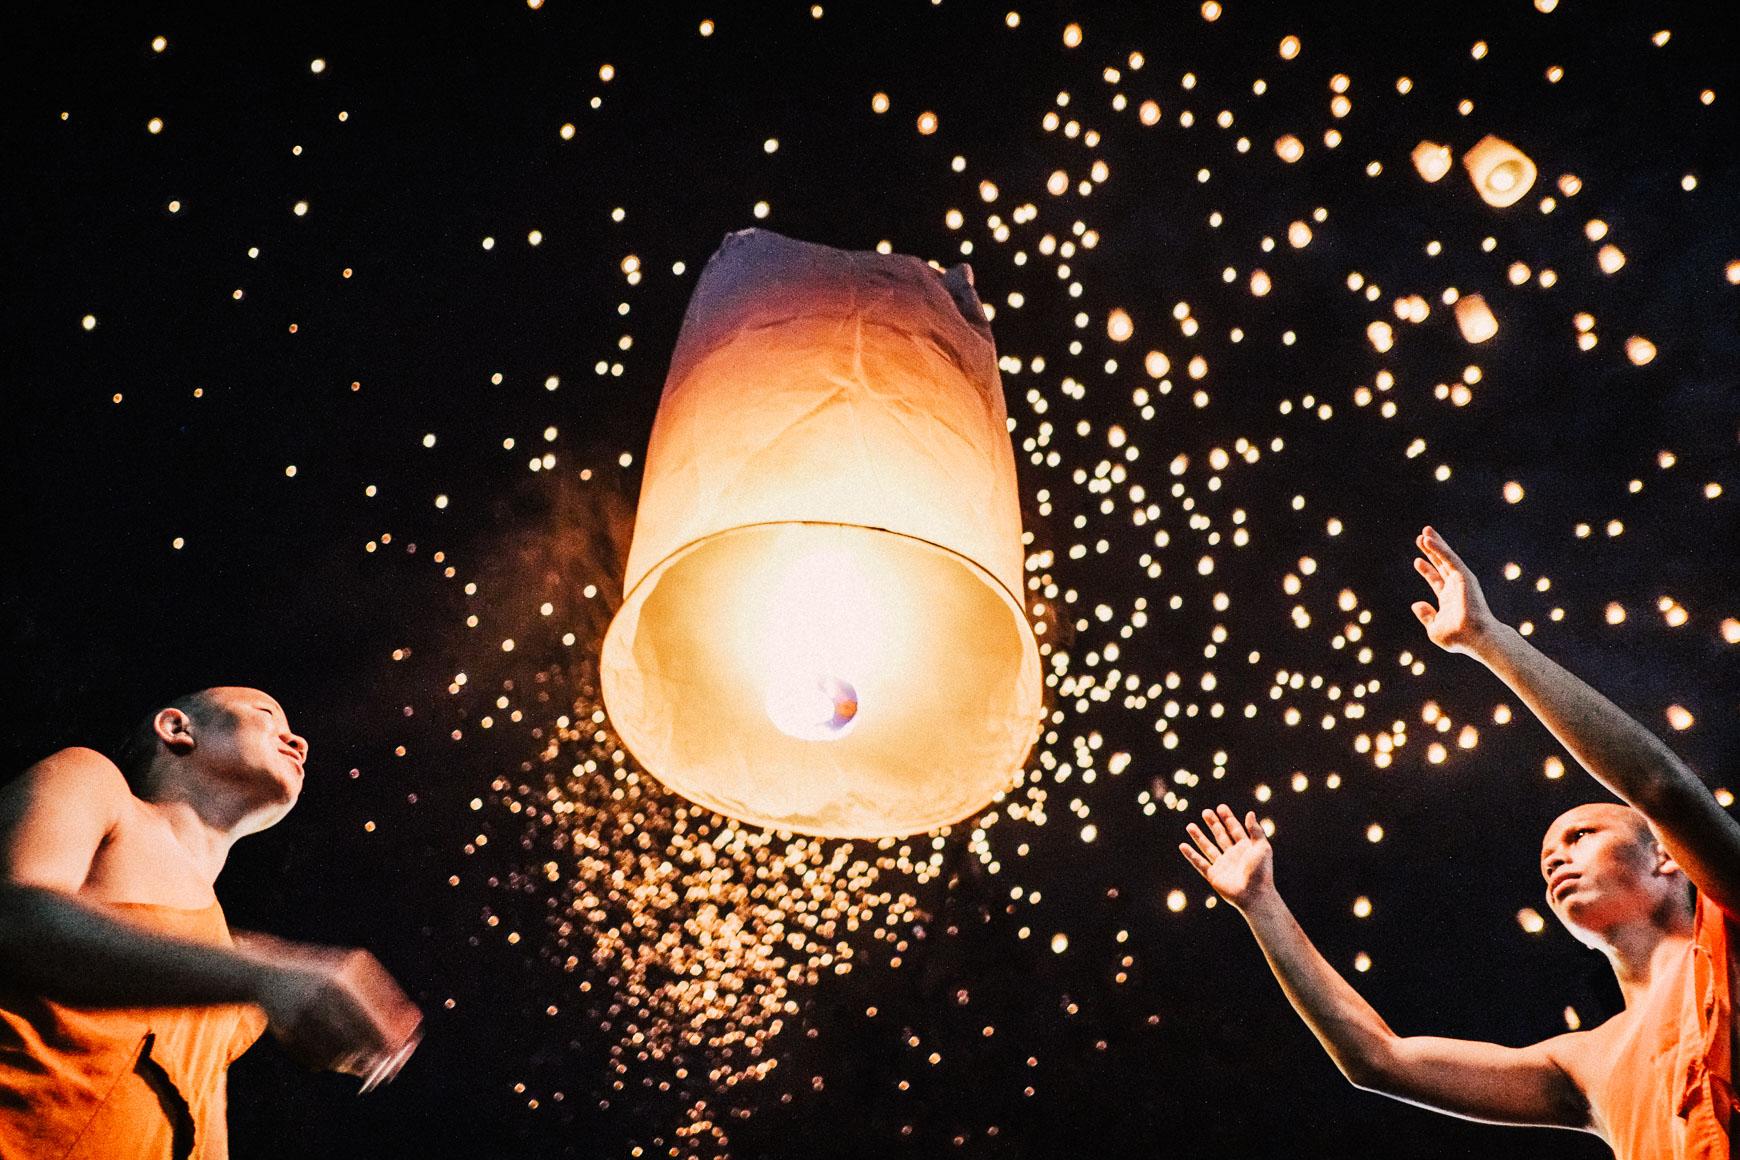 Lantern_Monk.jpg